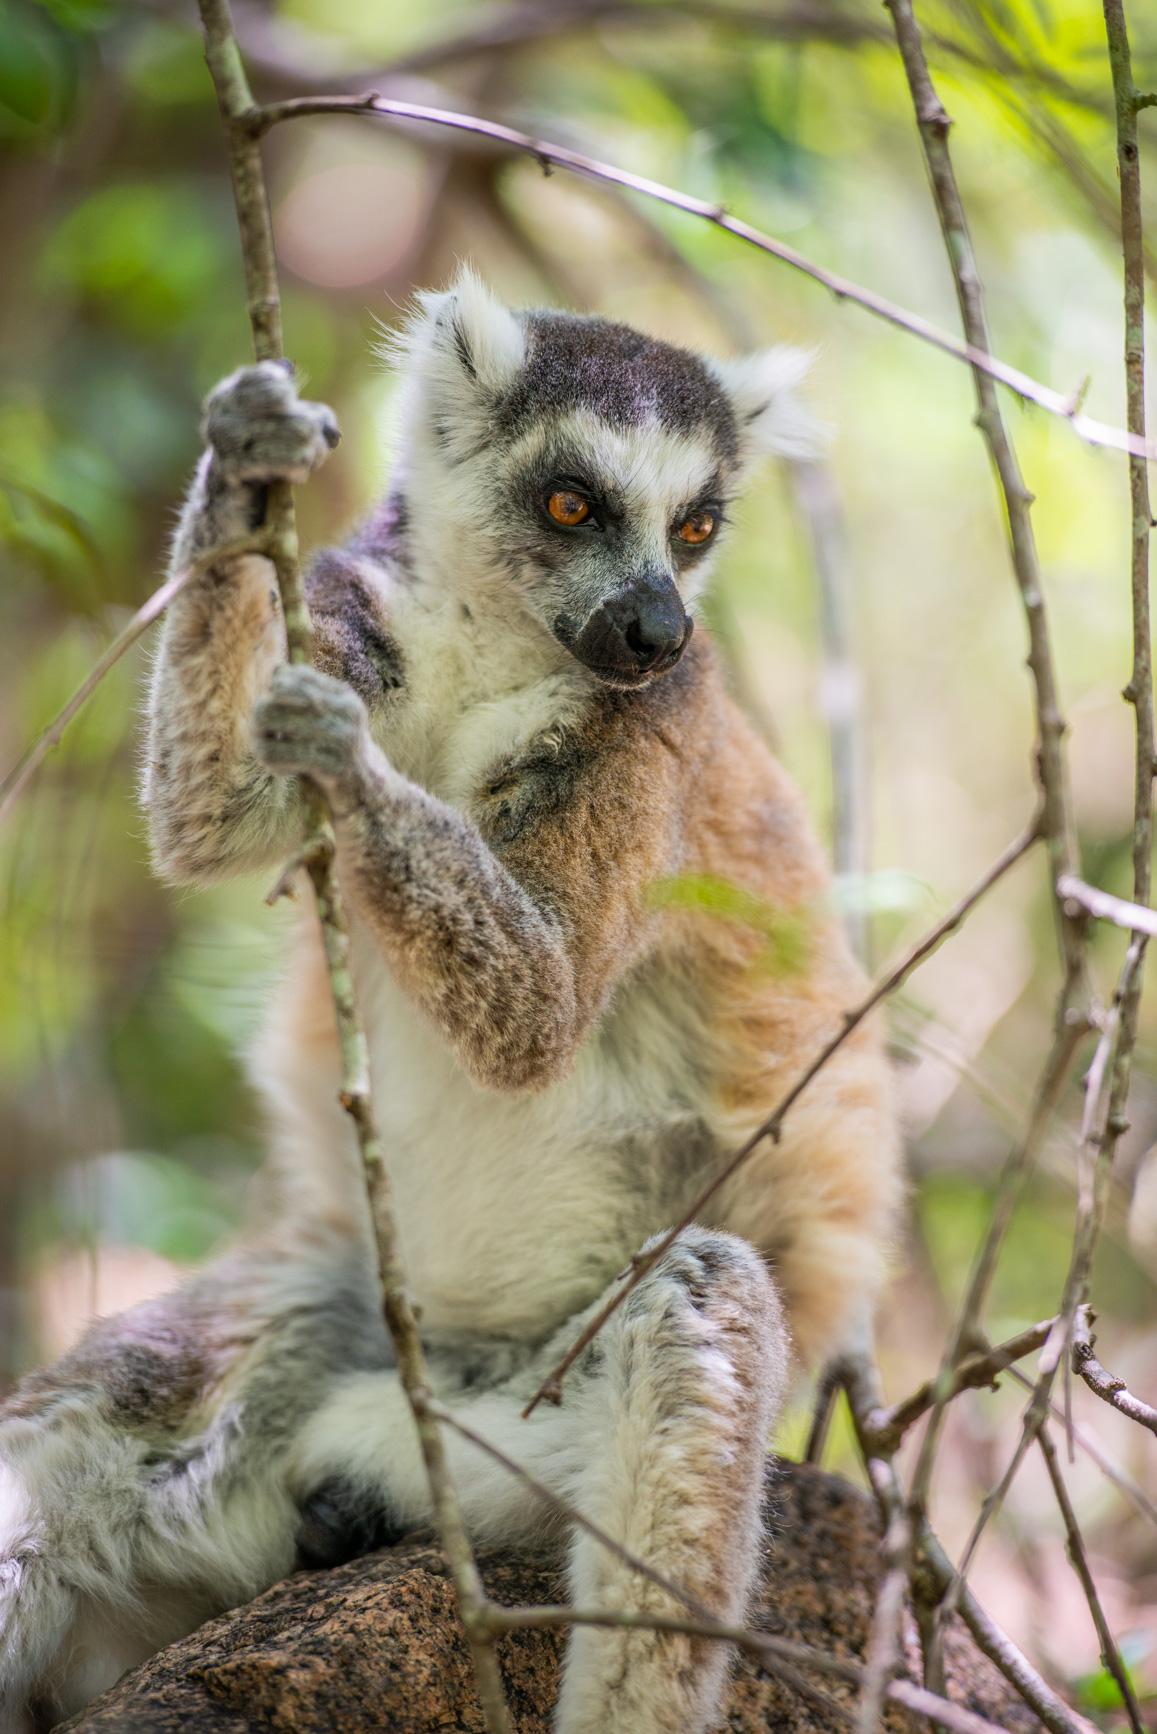 https://bubo.sk/uploads/galleries/7310/roberttaraba_madagaskar_lemur2-1.jpg